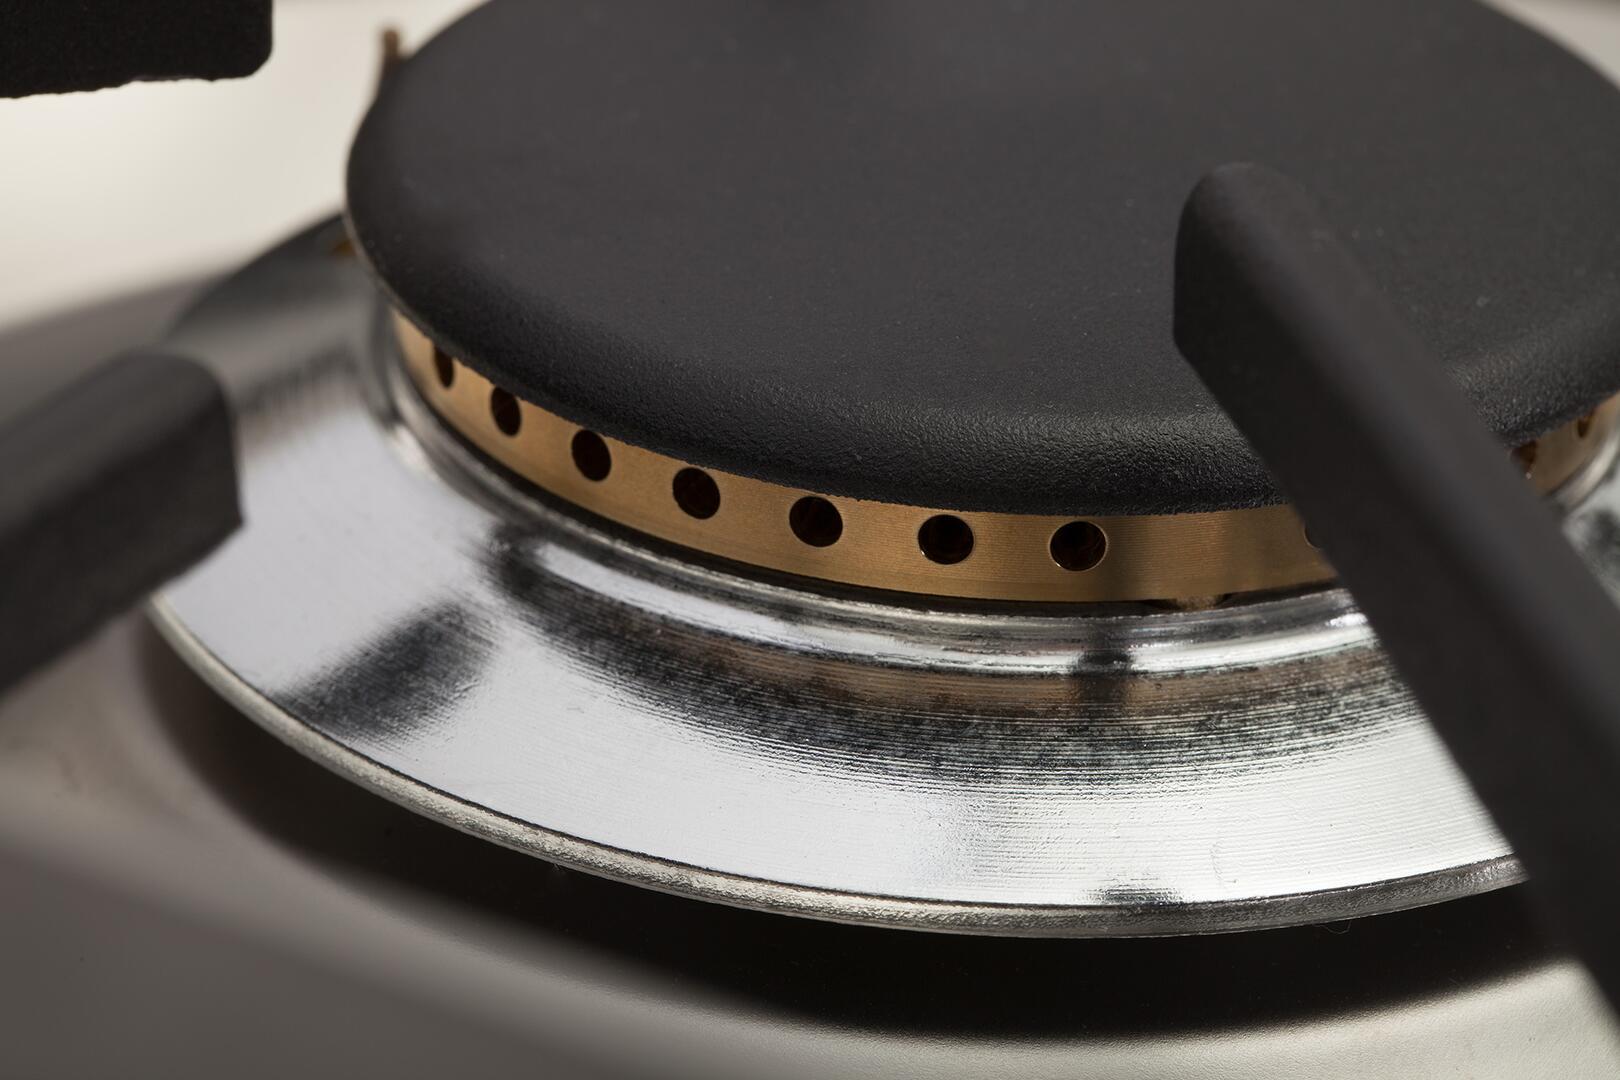 Ilve Professional Plus UPDW100FDMPM Freestanding Dual Fuel Range Gray, 5